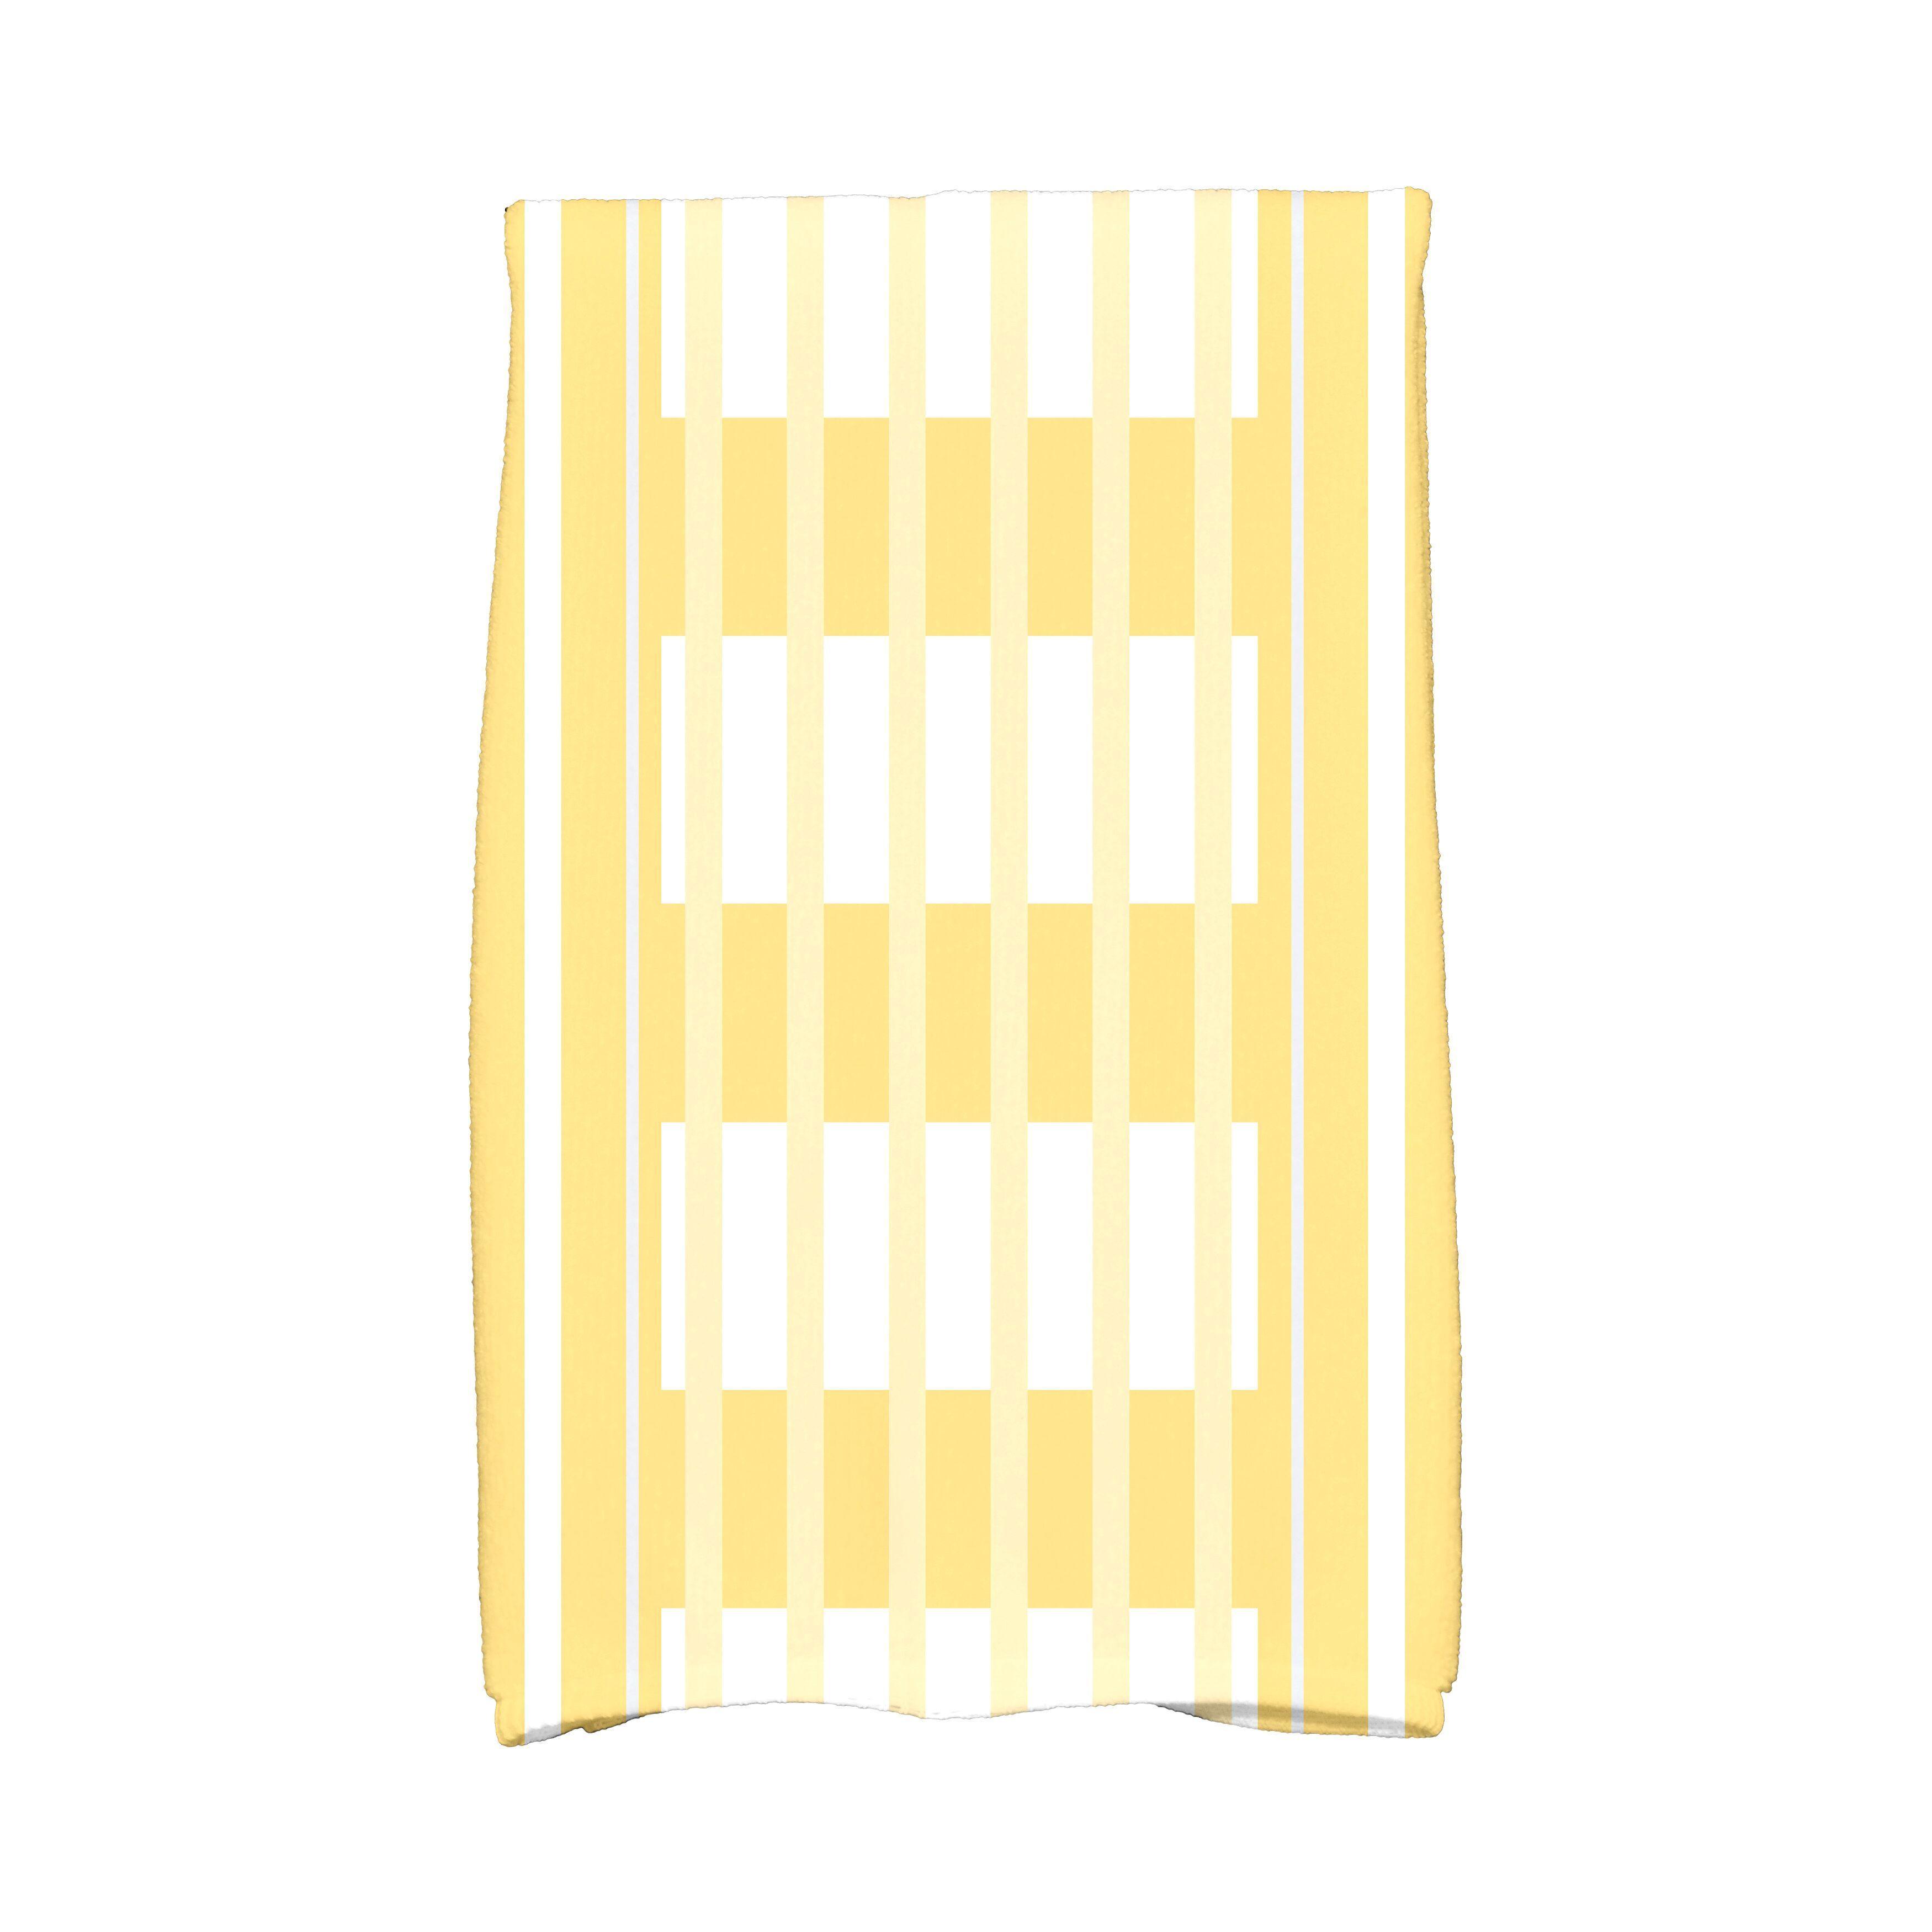 E By Design 16 x 25-inch, Beach Blanket, Stripe Print Kit...